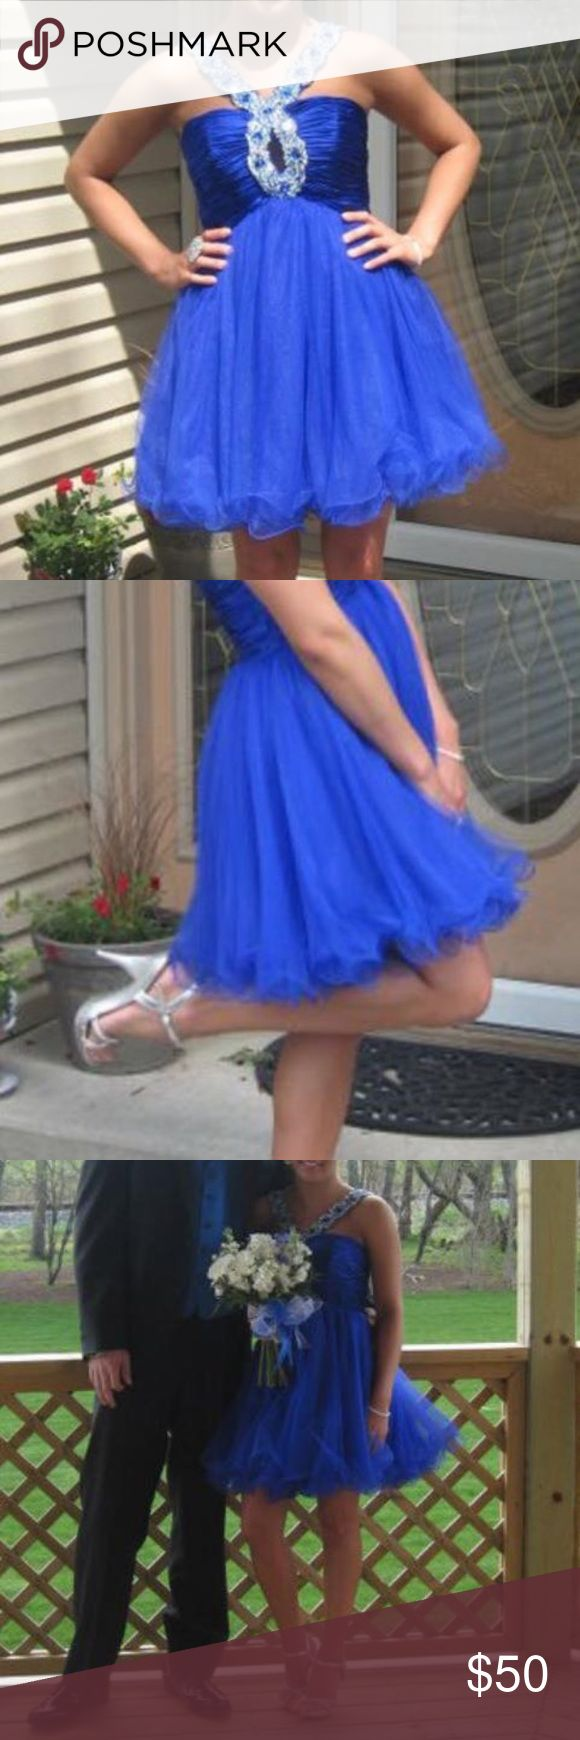 Sherri Hill Prom Dress It's a short royal blue dress ! Perfect for dances! Price is negotiable 🤗 Sherri Hill Dresses Prom